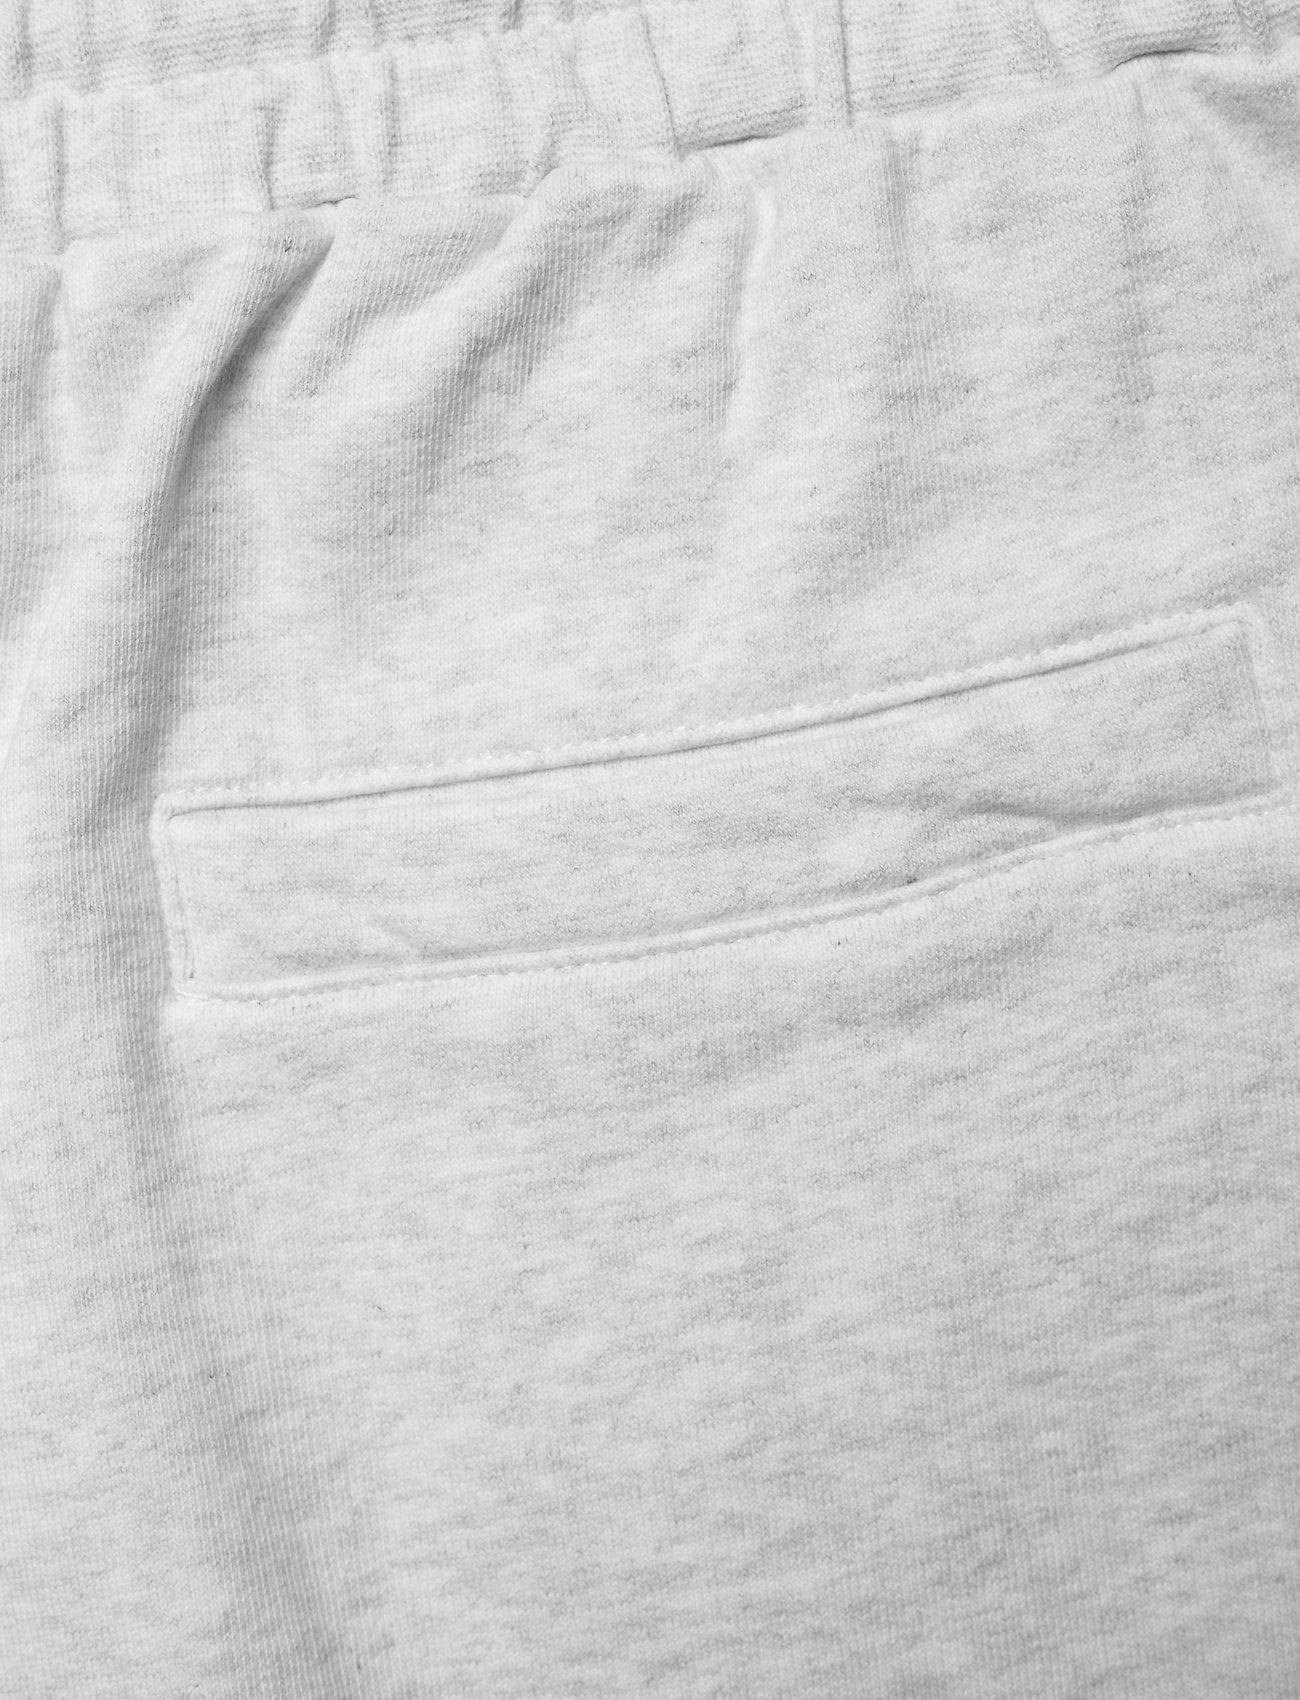 HAN Kjøbenhavn - Sweat shorts - casual shorts - light grey melange logo - 4